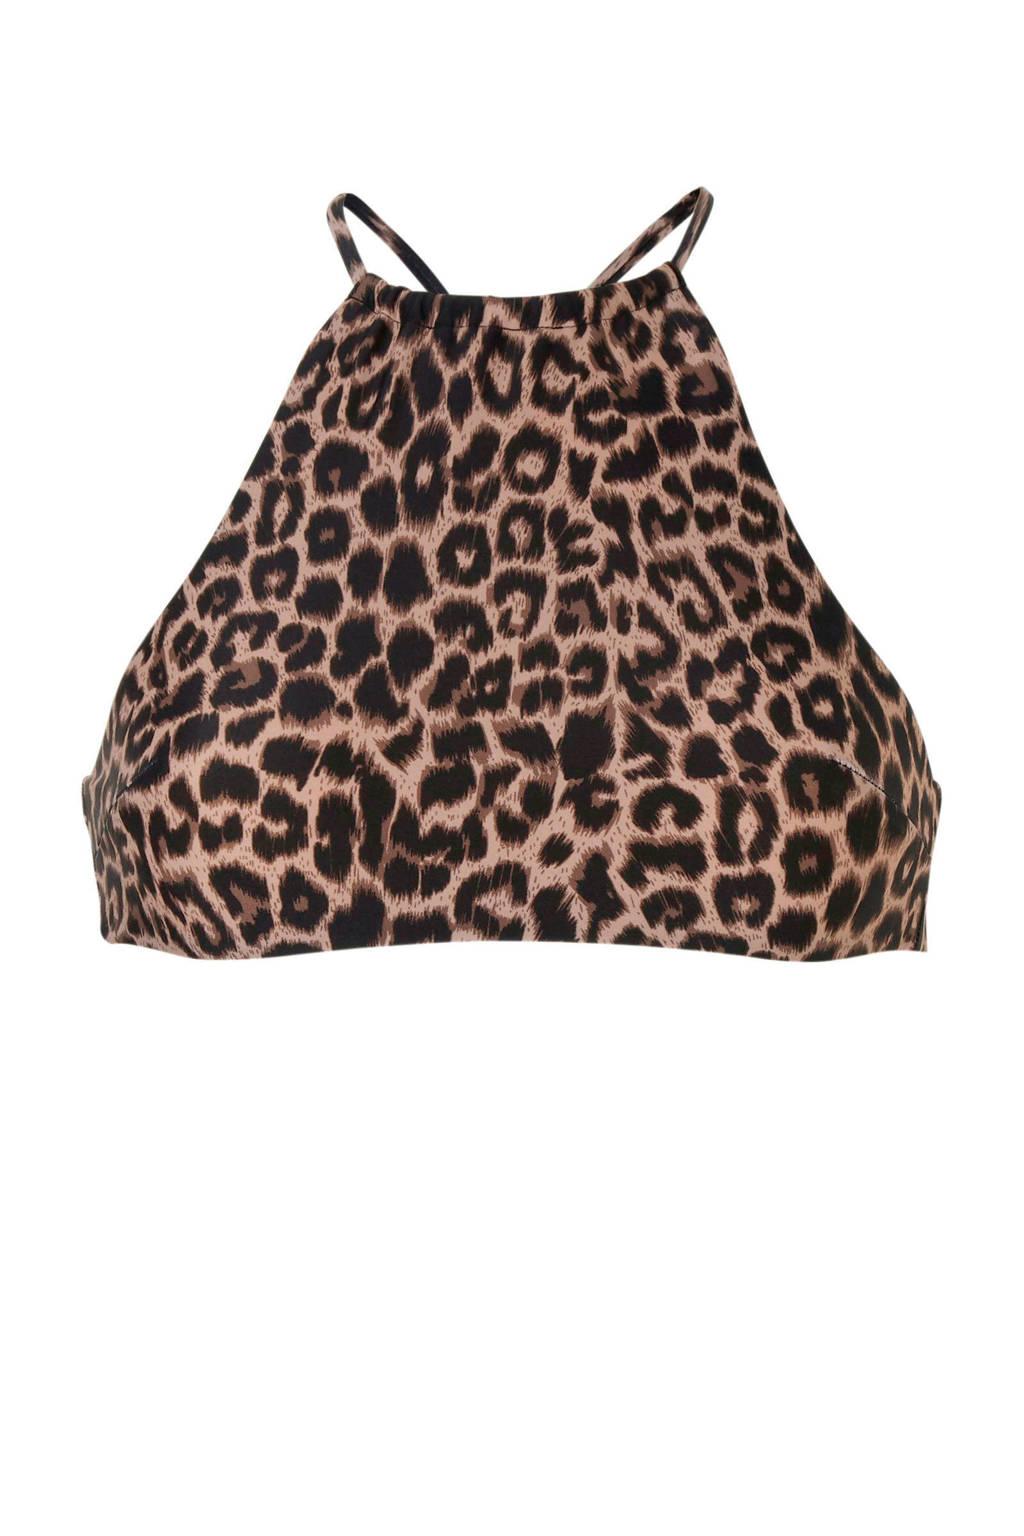 Catwalk Junkie crop bikinitop in een panterprint zwart, Zwart/bruin